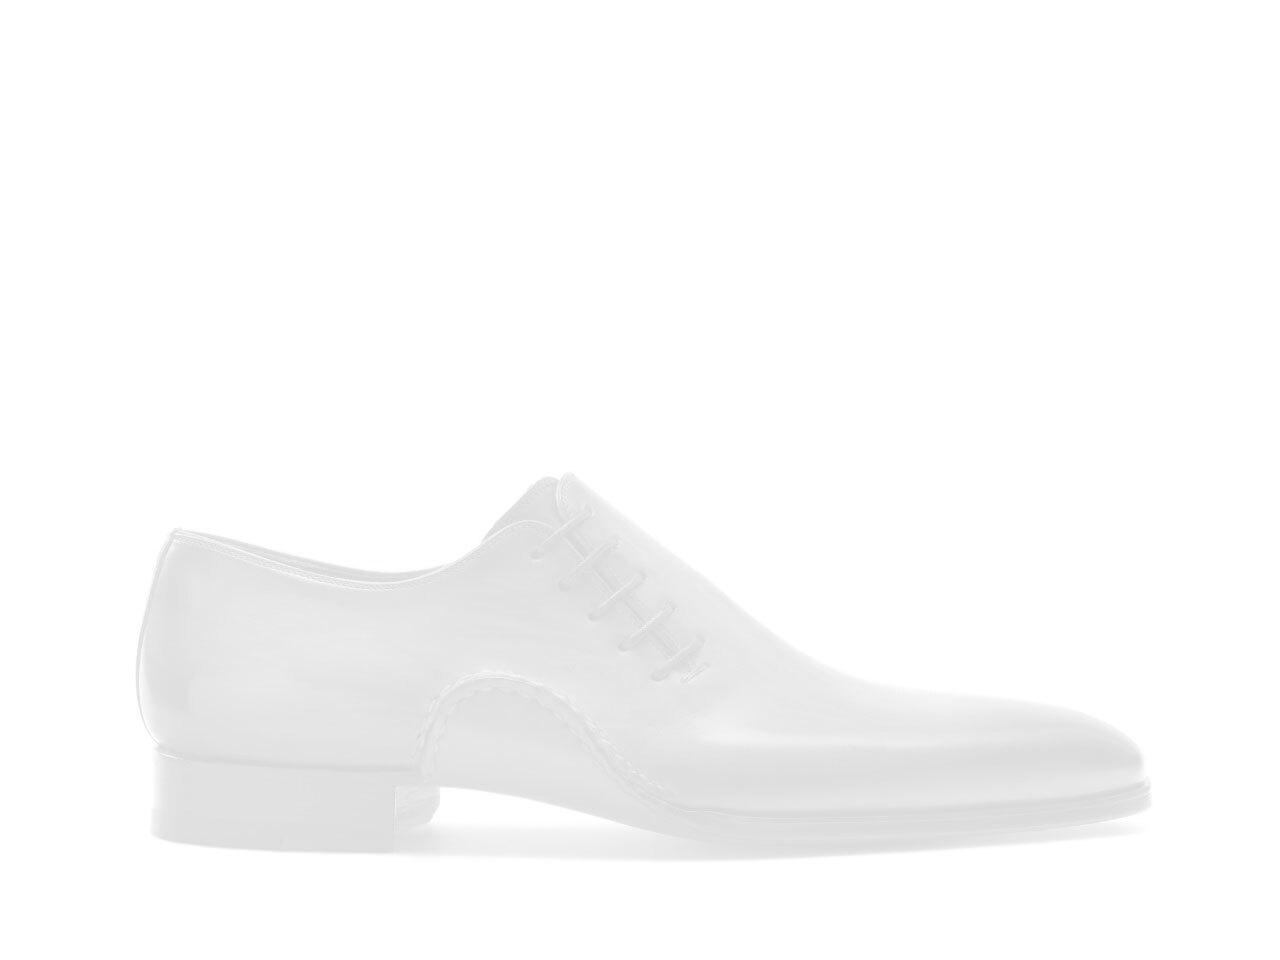 Pair of the Magnanni Lizandro Black Men's Sneakers